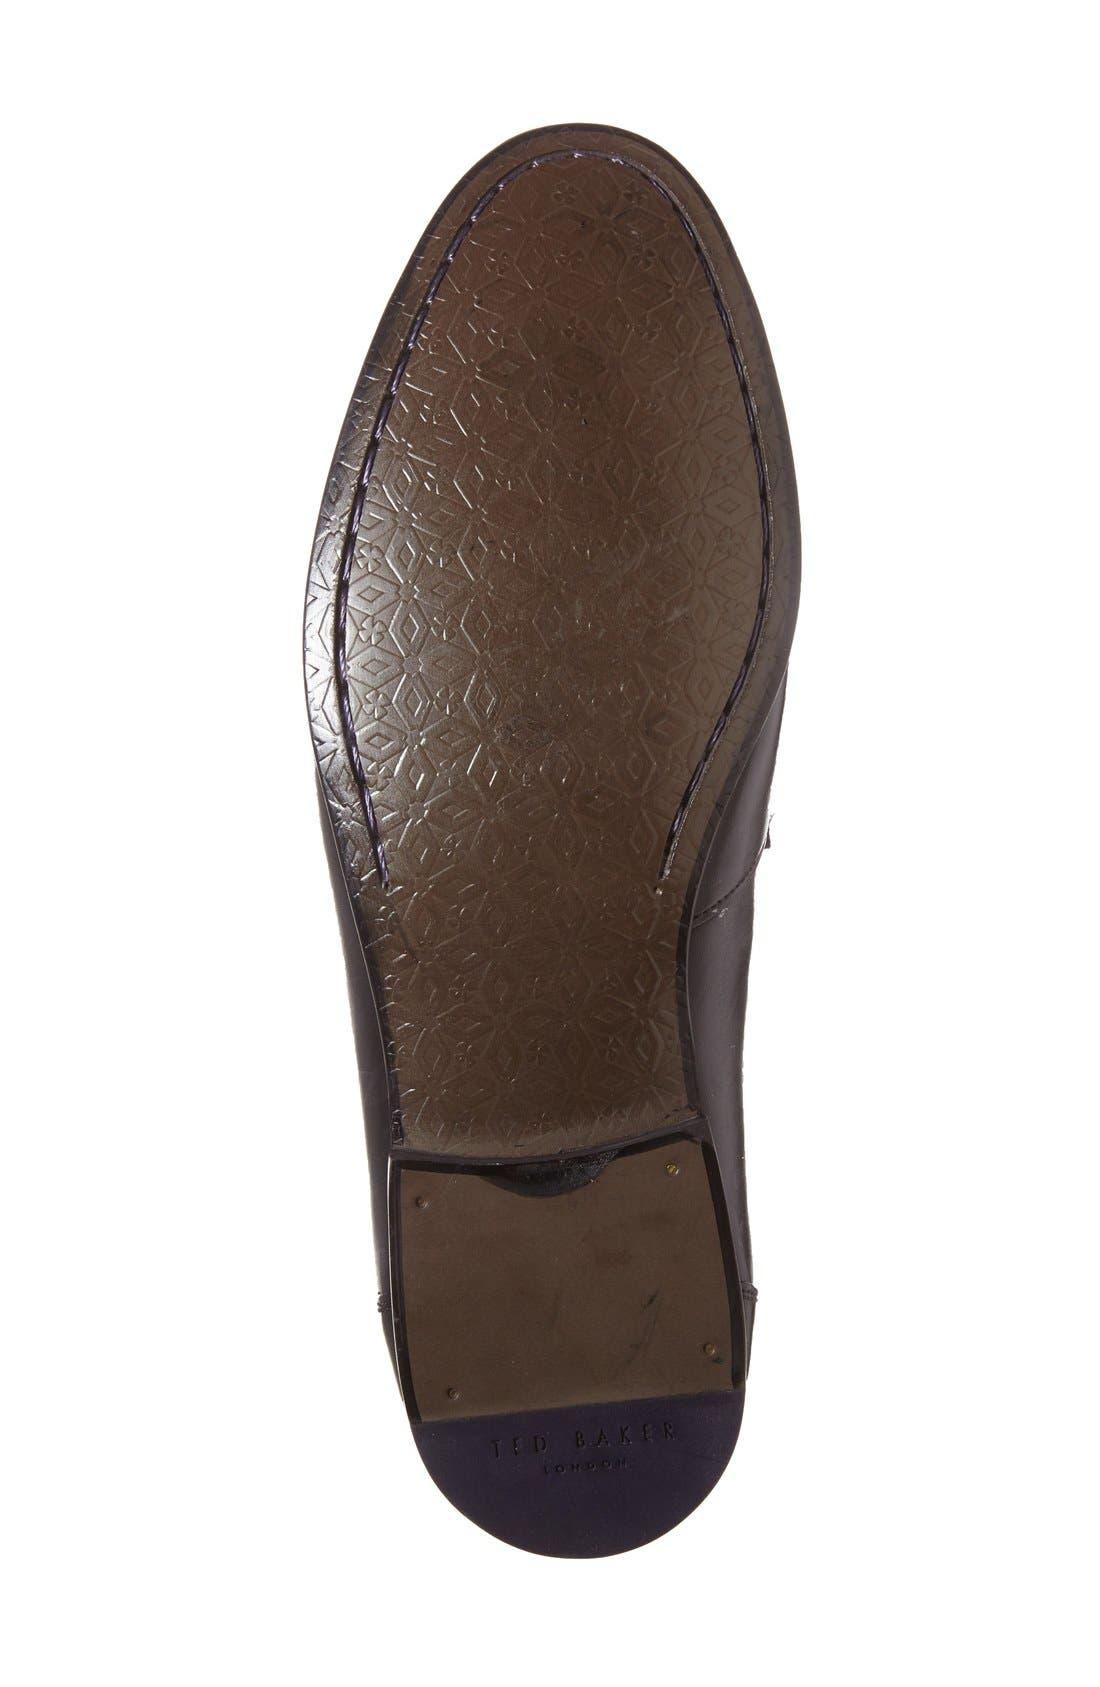 'Simeen 3' Venetian Loafer,                             Alternate thumbnail 3, color,                             001